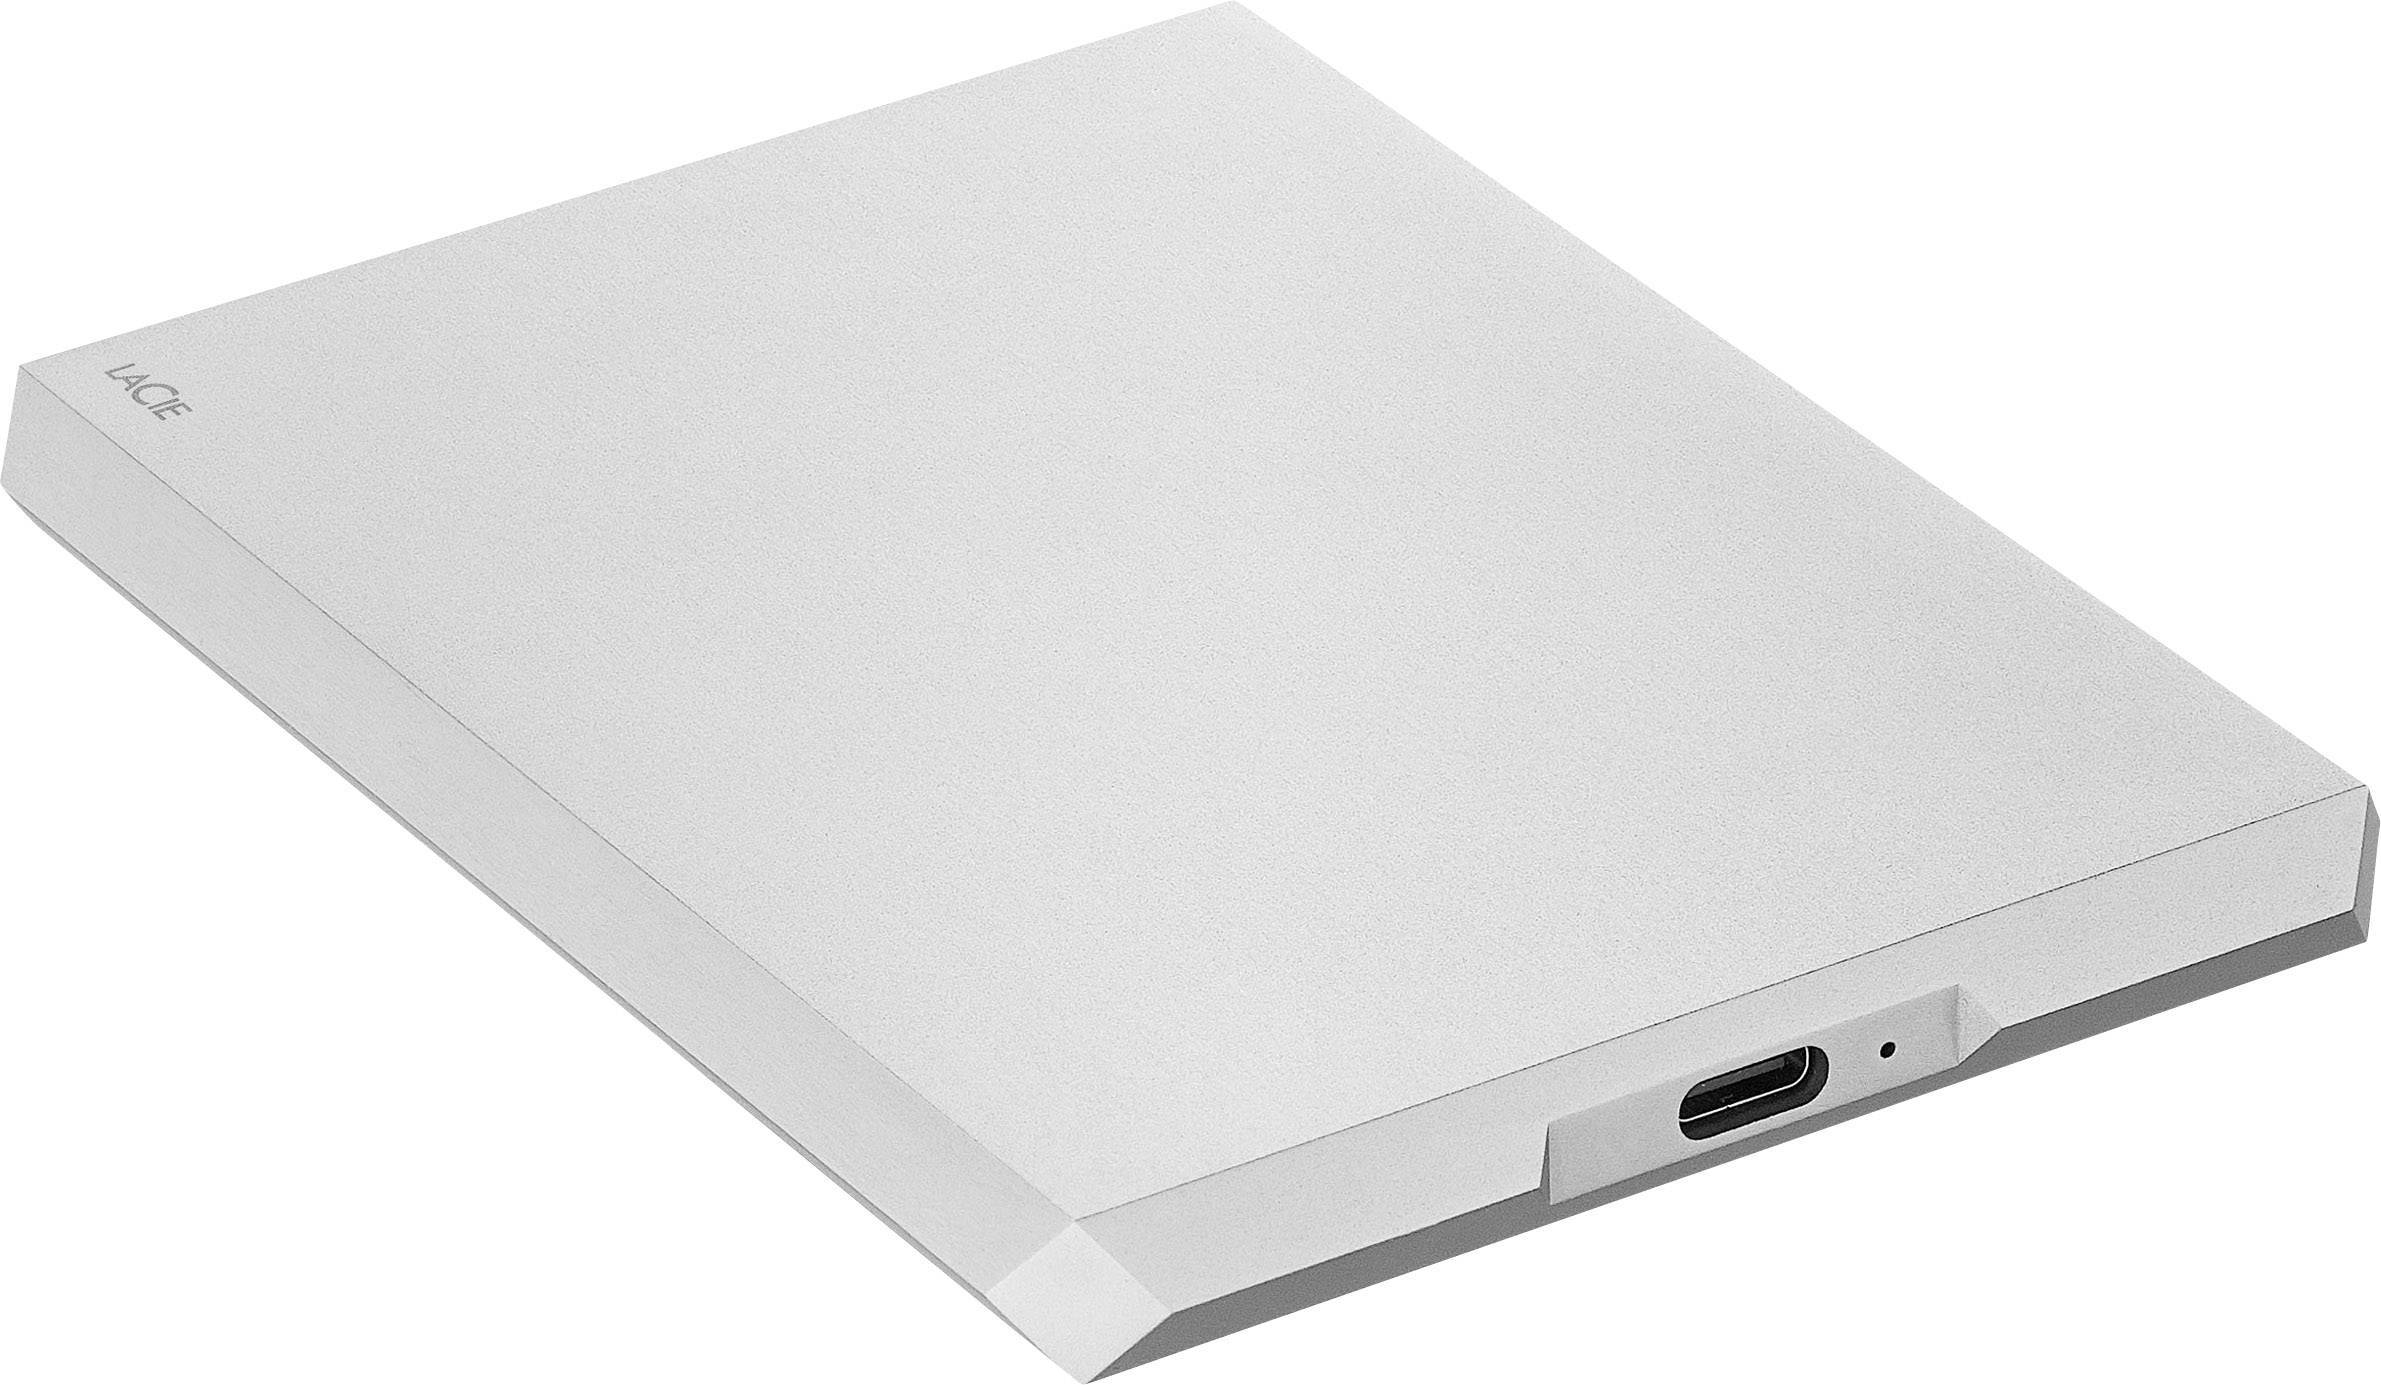 LaCie Disque Dur Mobile Drive Moon Silver USB-C 1TB